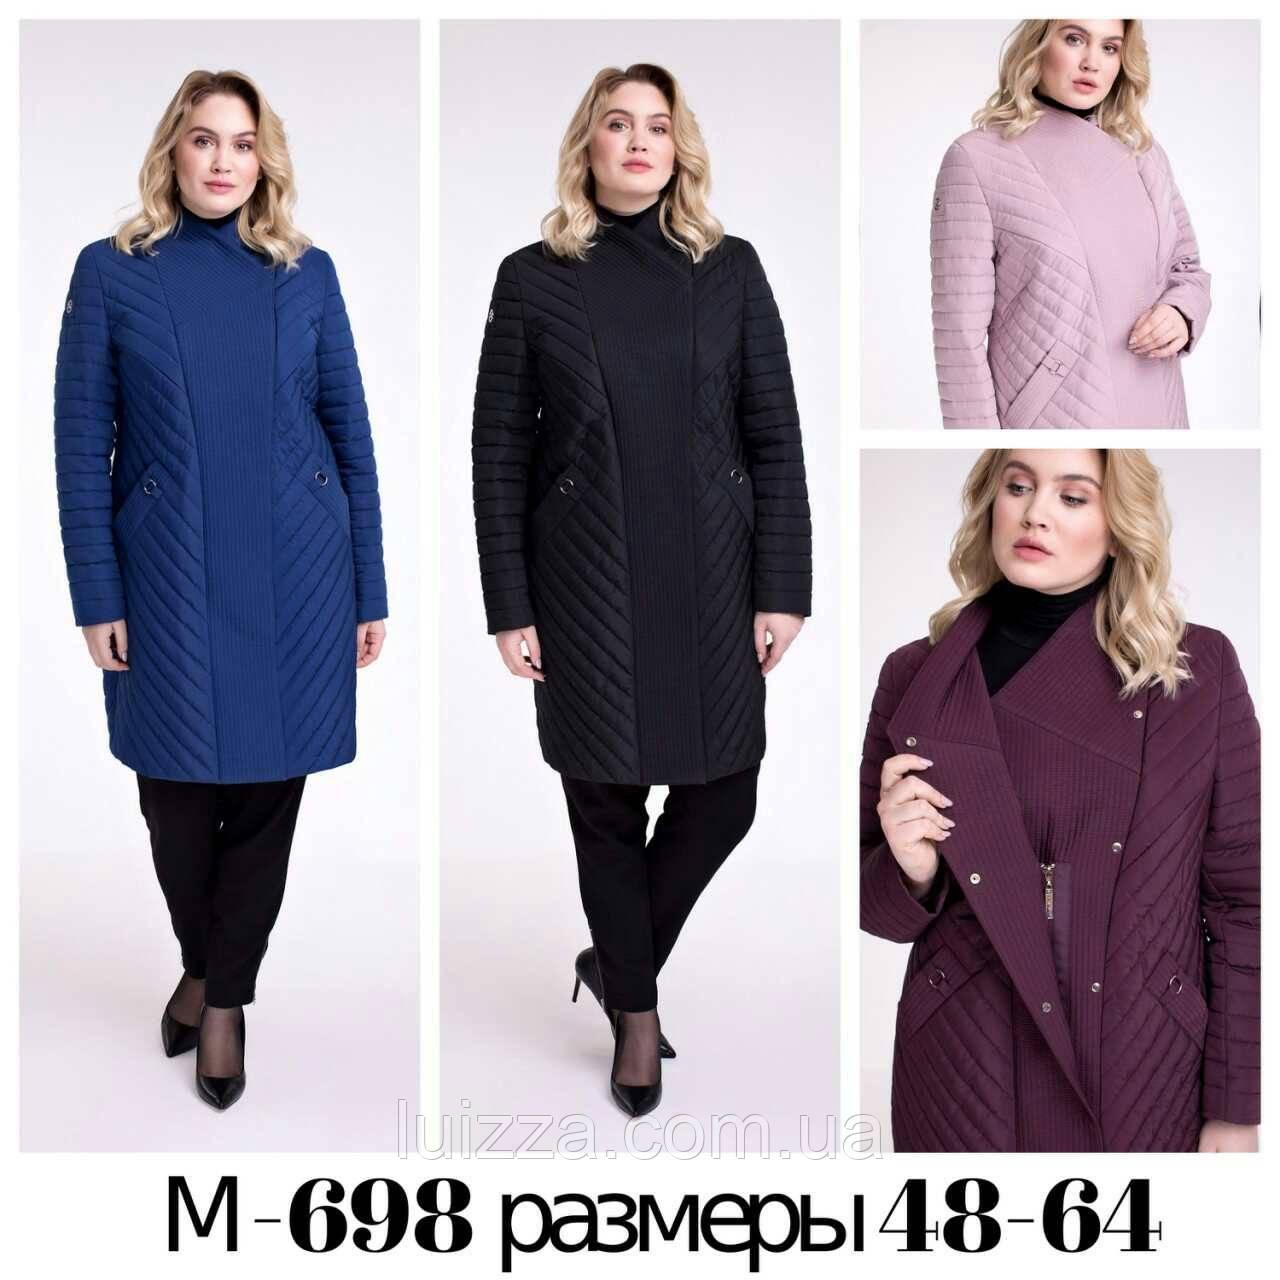 2e02a9005e1 Женское пальто черное осень-весна 48-64р - Luizza-Луиза женская одежда  больших